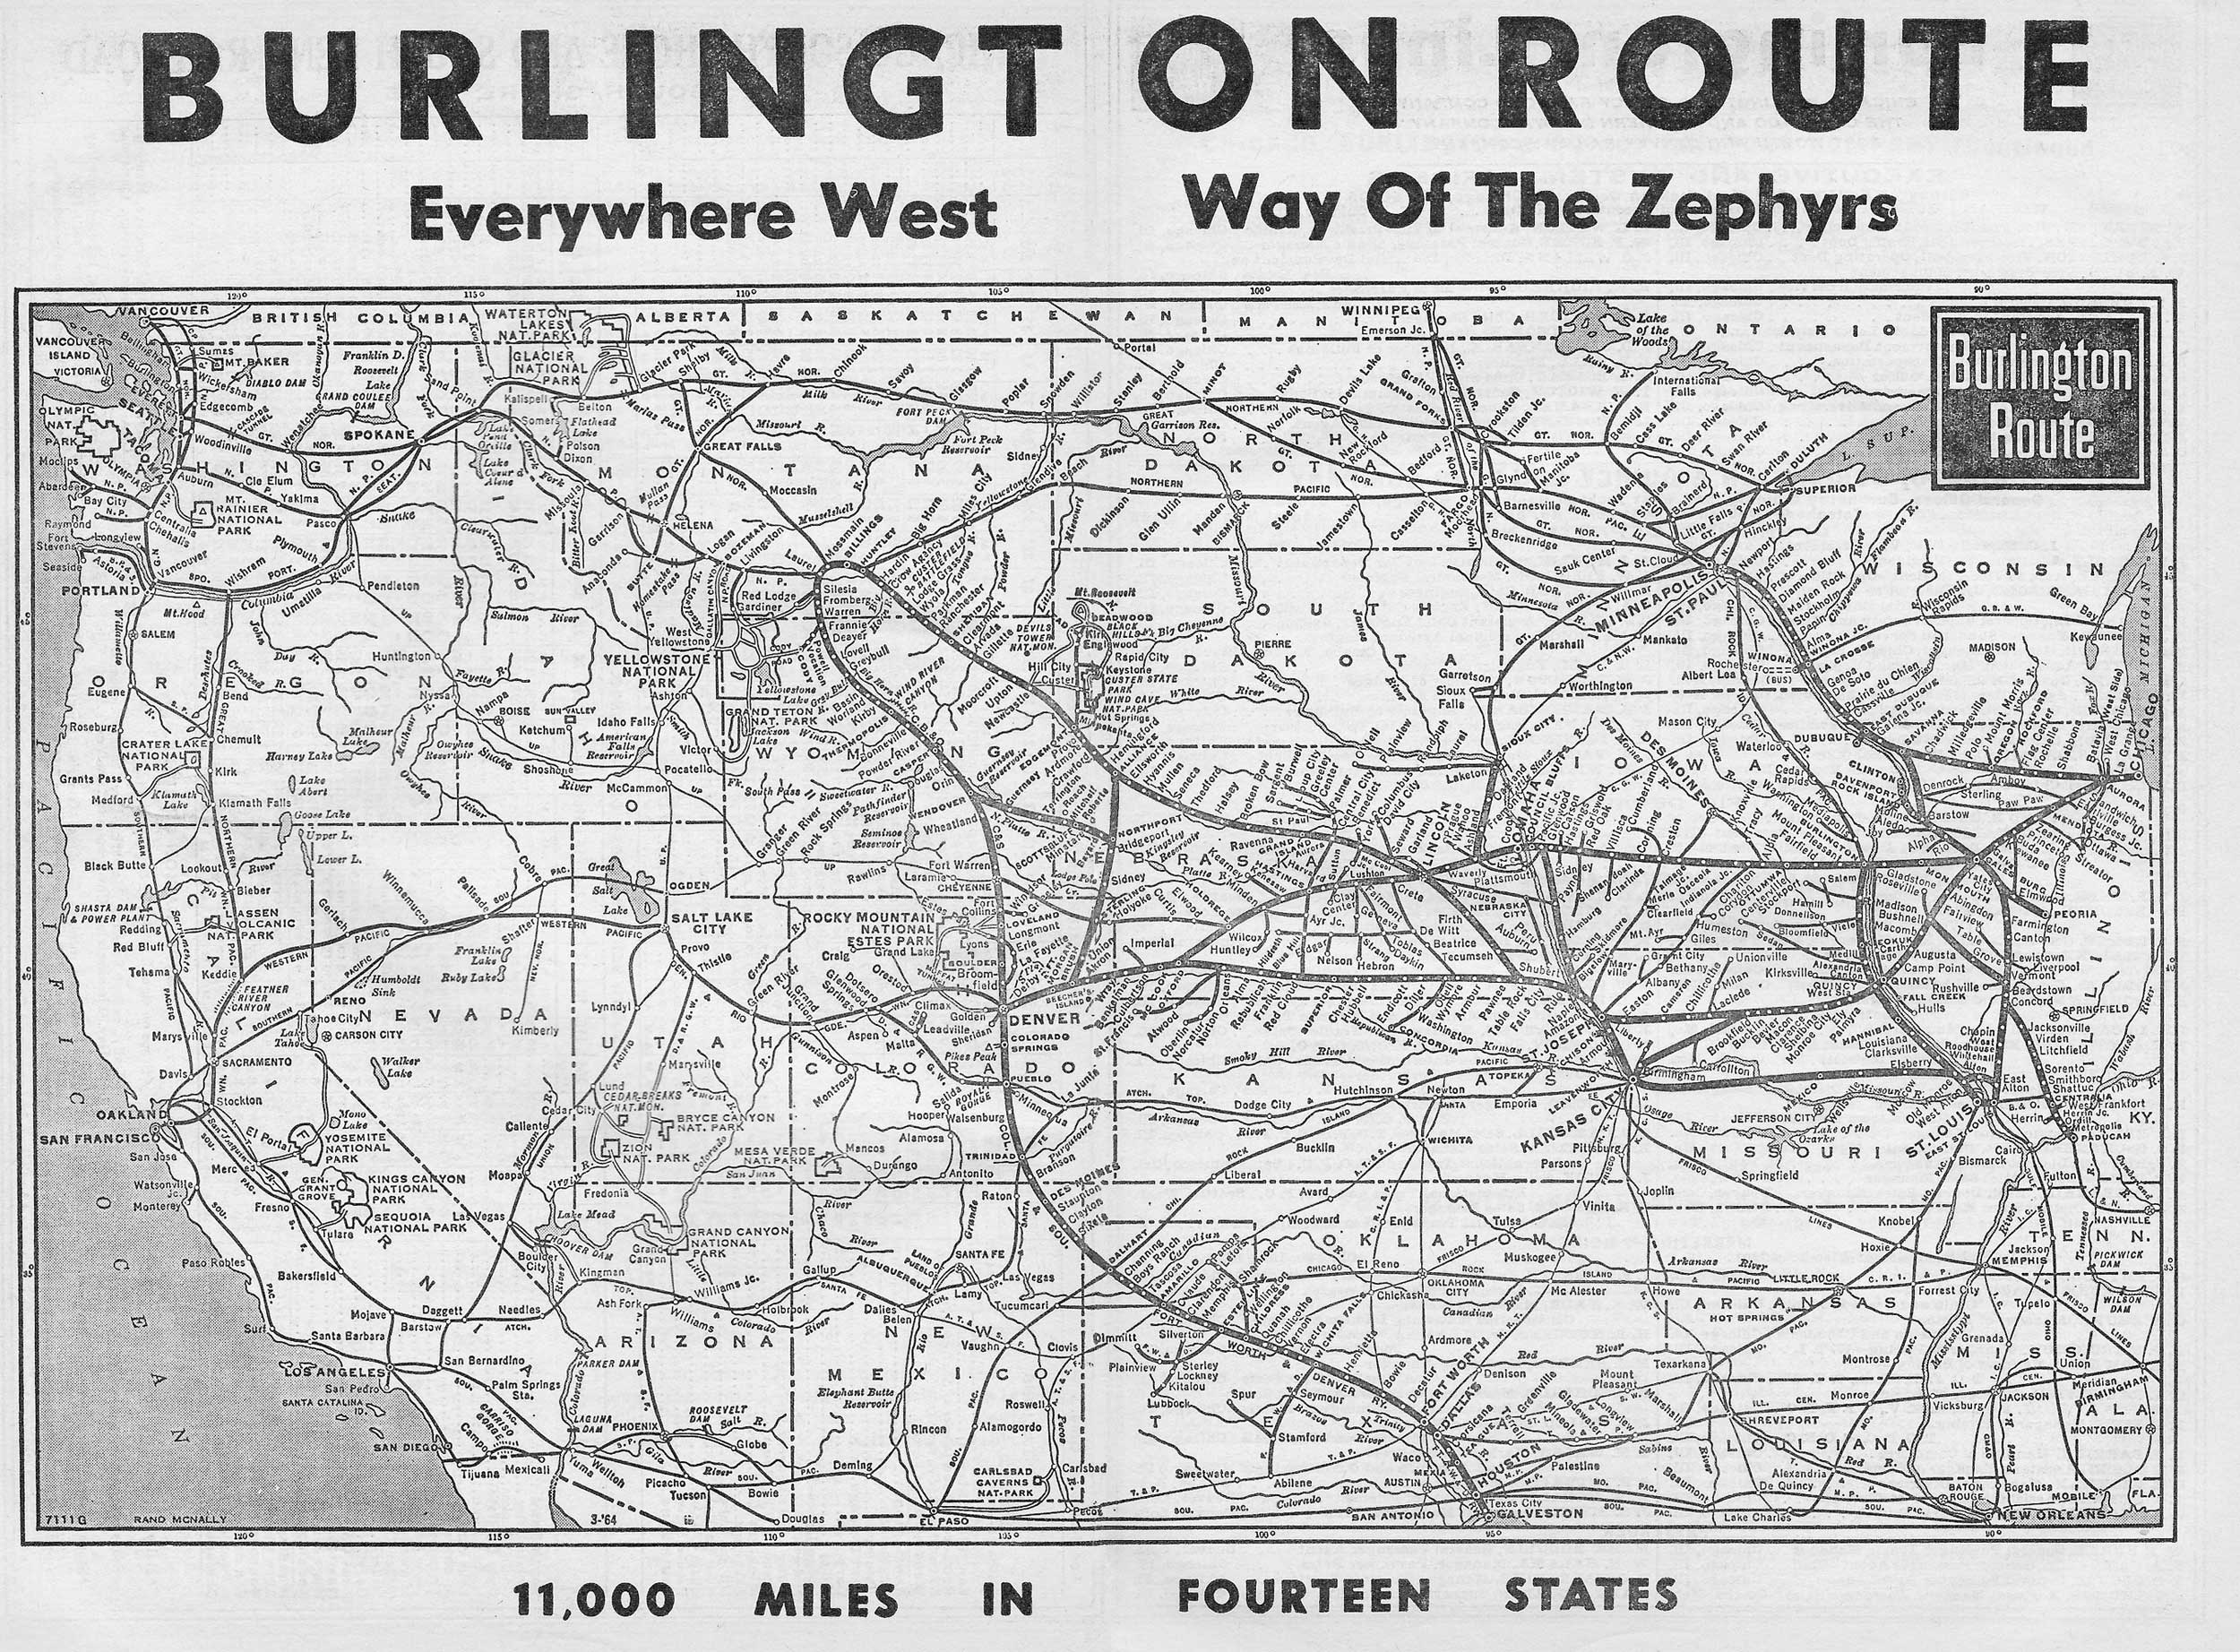 Transportation Company - Burlington Route - Railroad